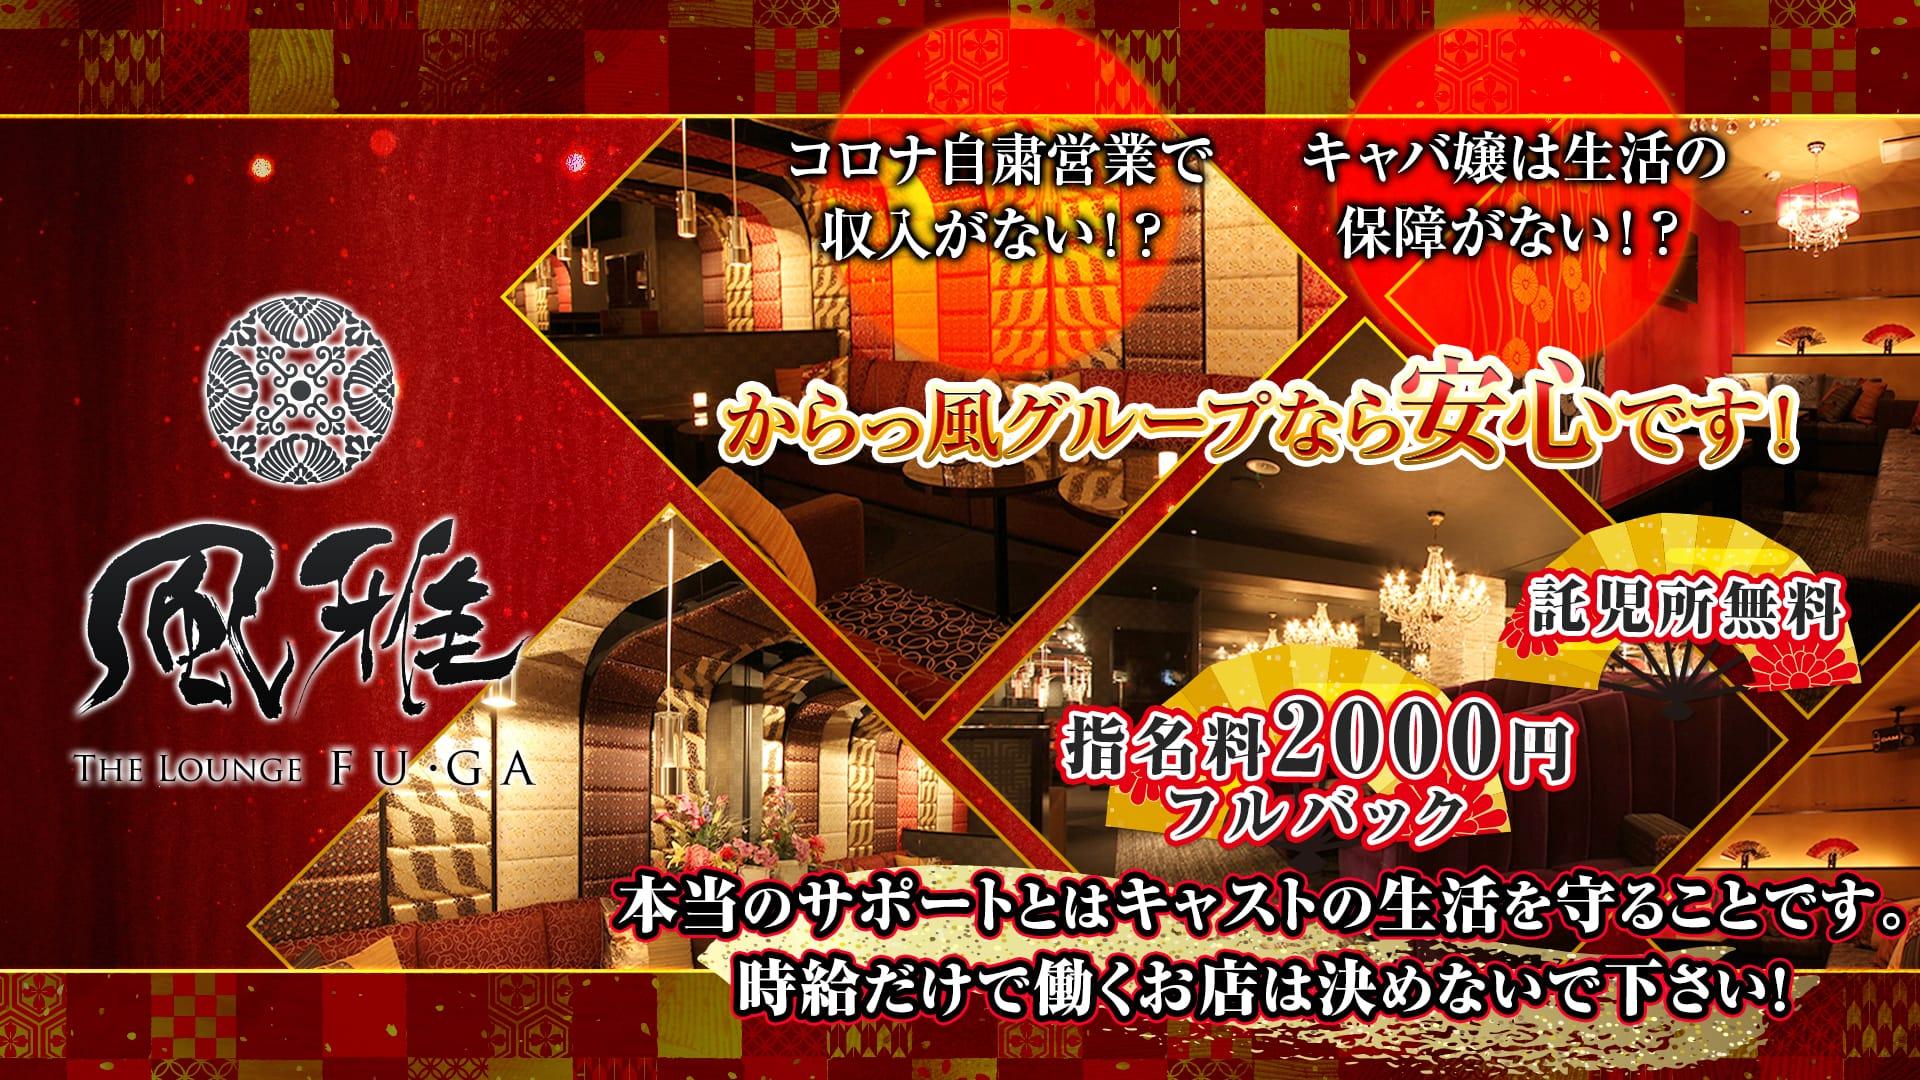 THE LOUNGE 風雅 権堂キャバクラ TOP画像